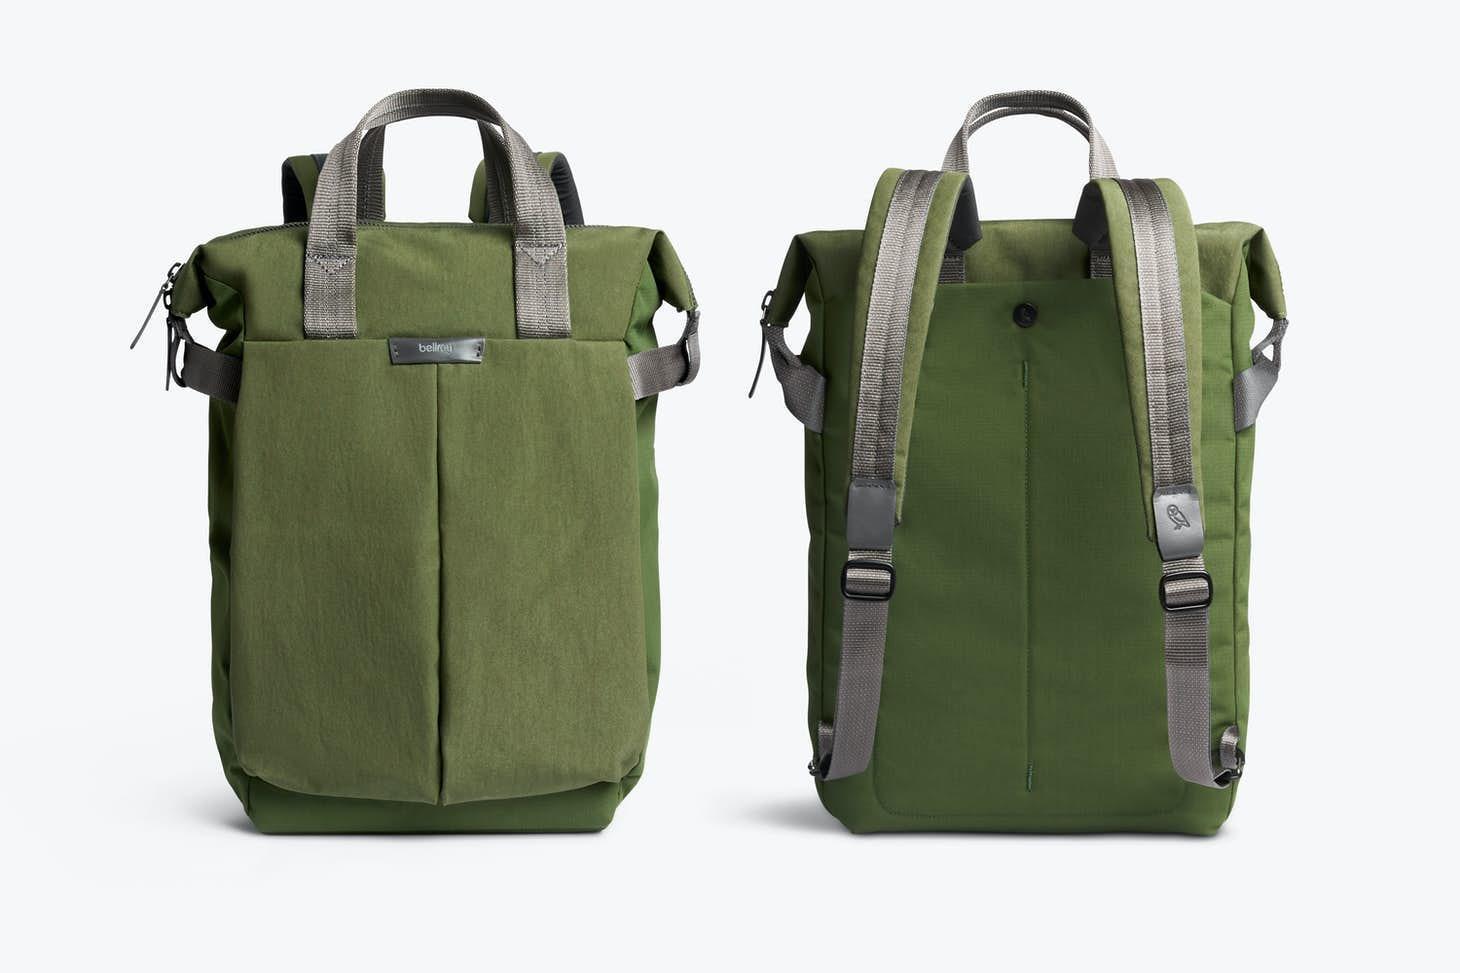 Tokyo Tote backpack